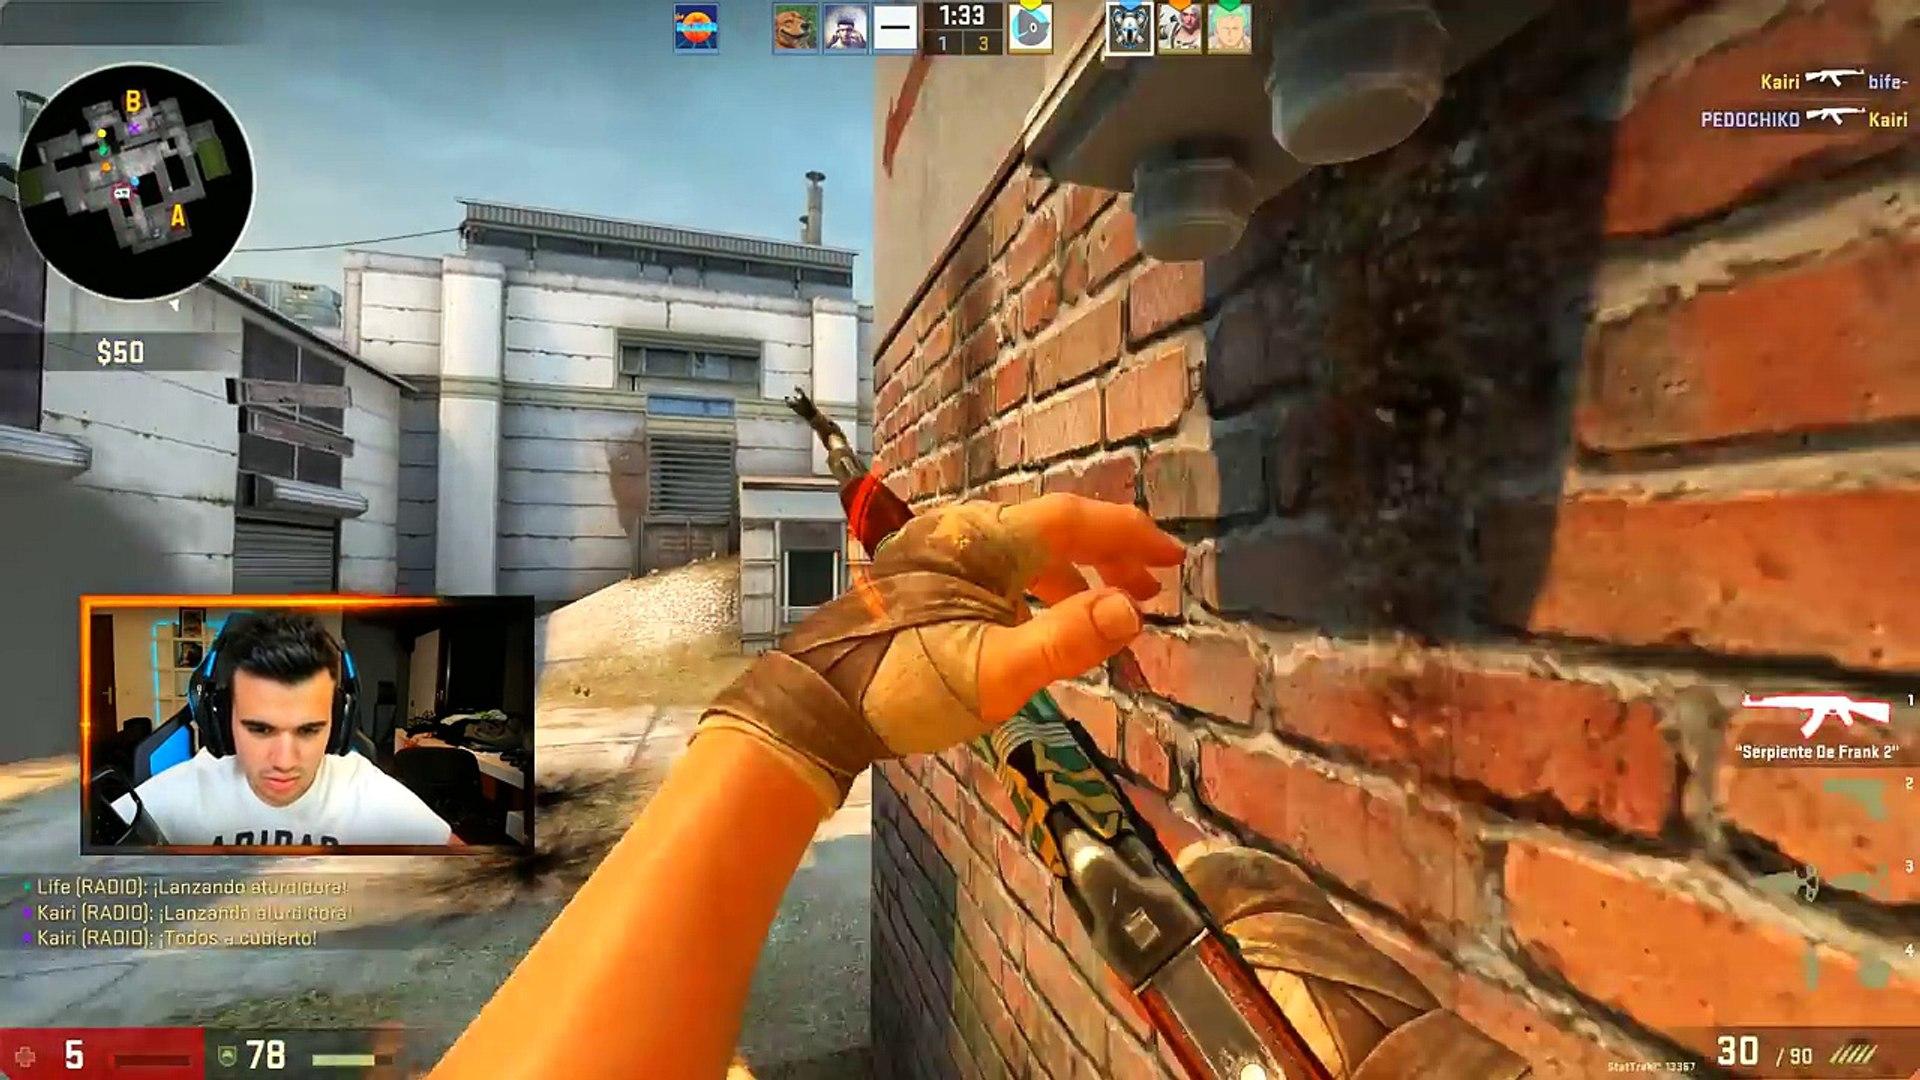 MUERO DE TODAS LAS FORMAS POSIBLES!!Counter Strike: Global Offensive #216 sTaXx